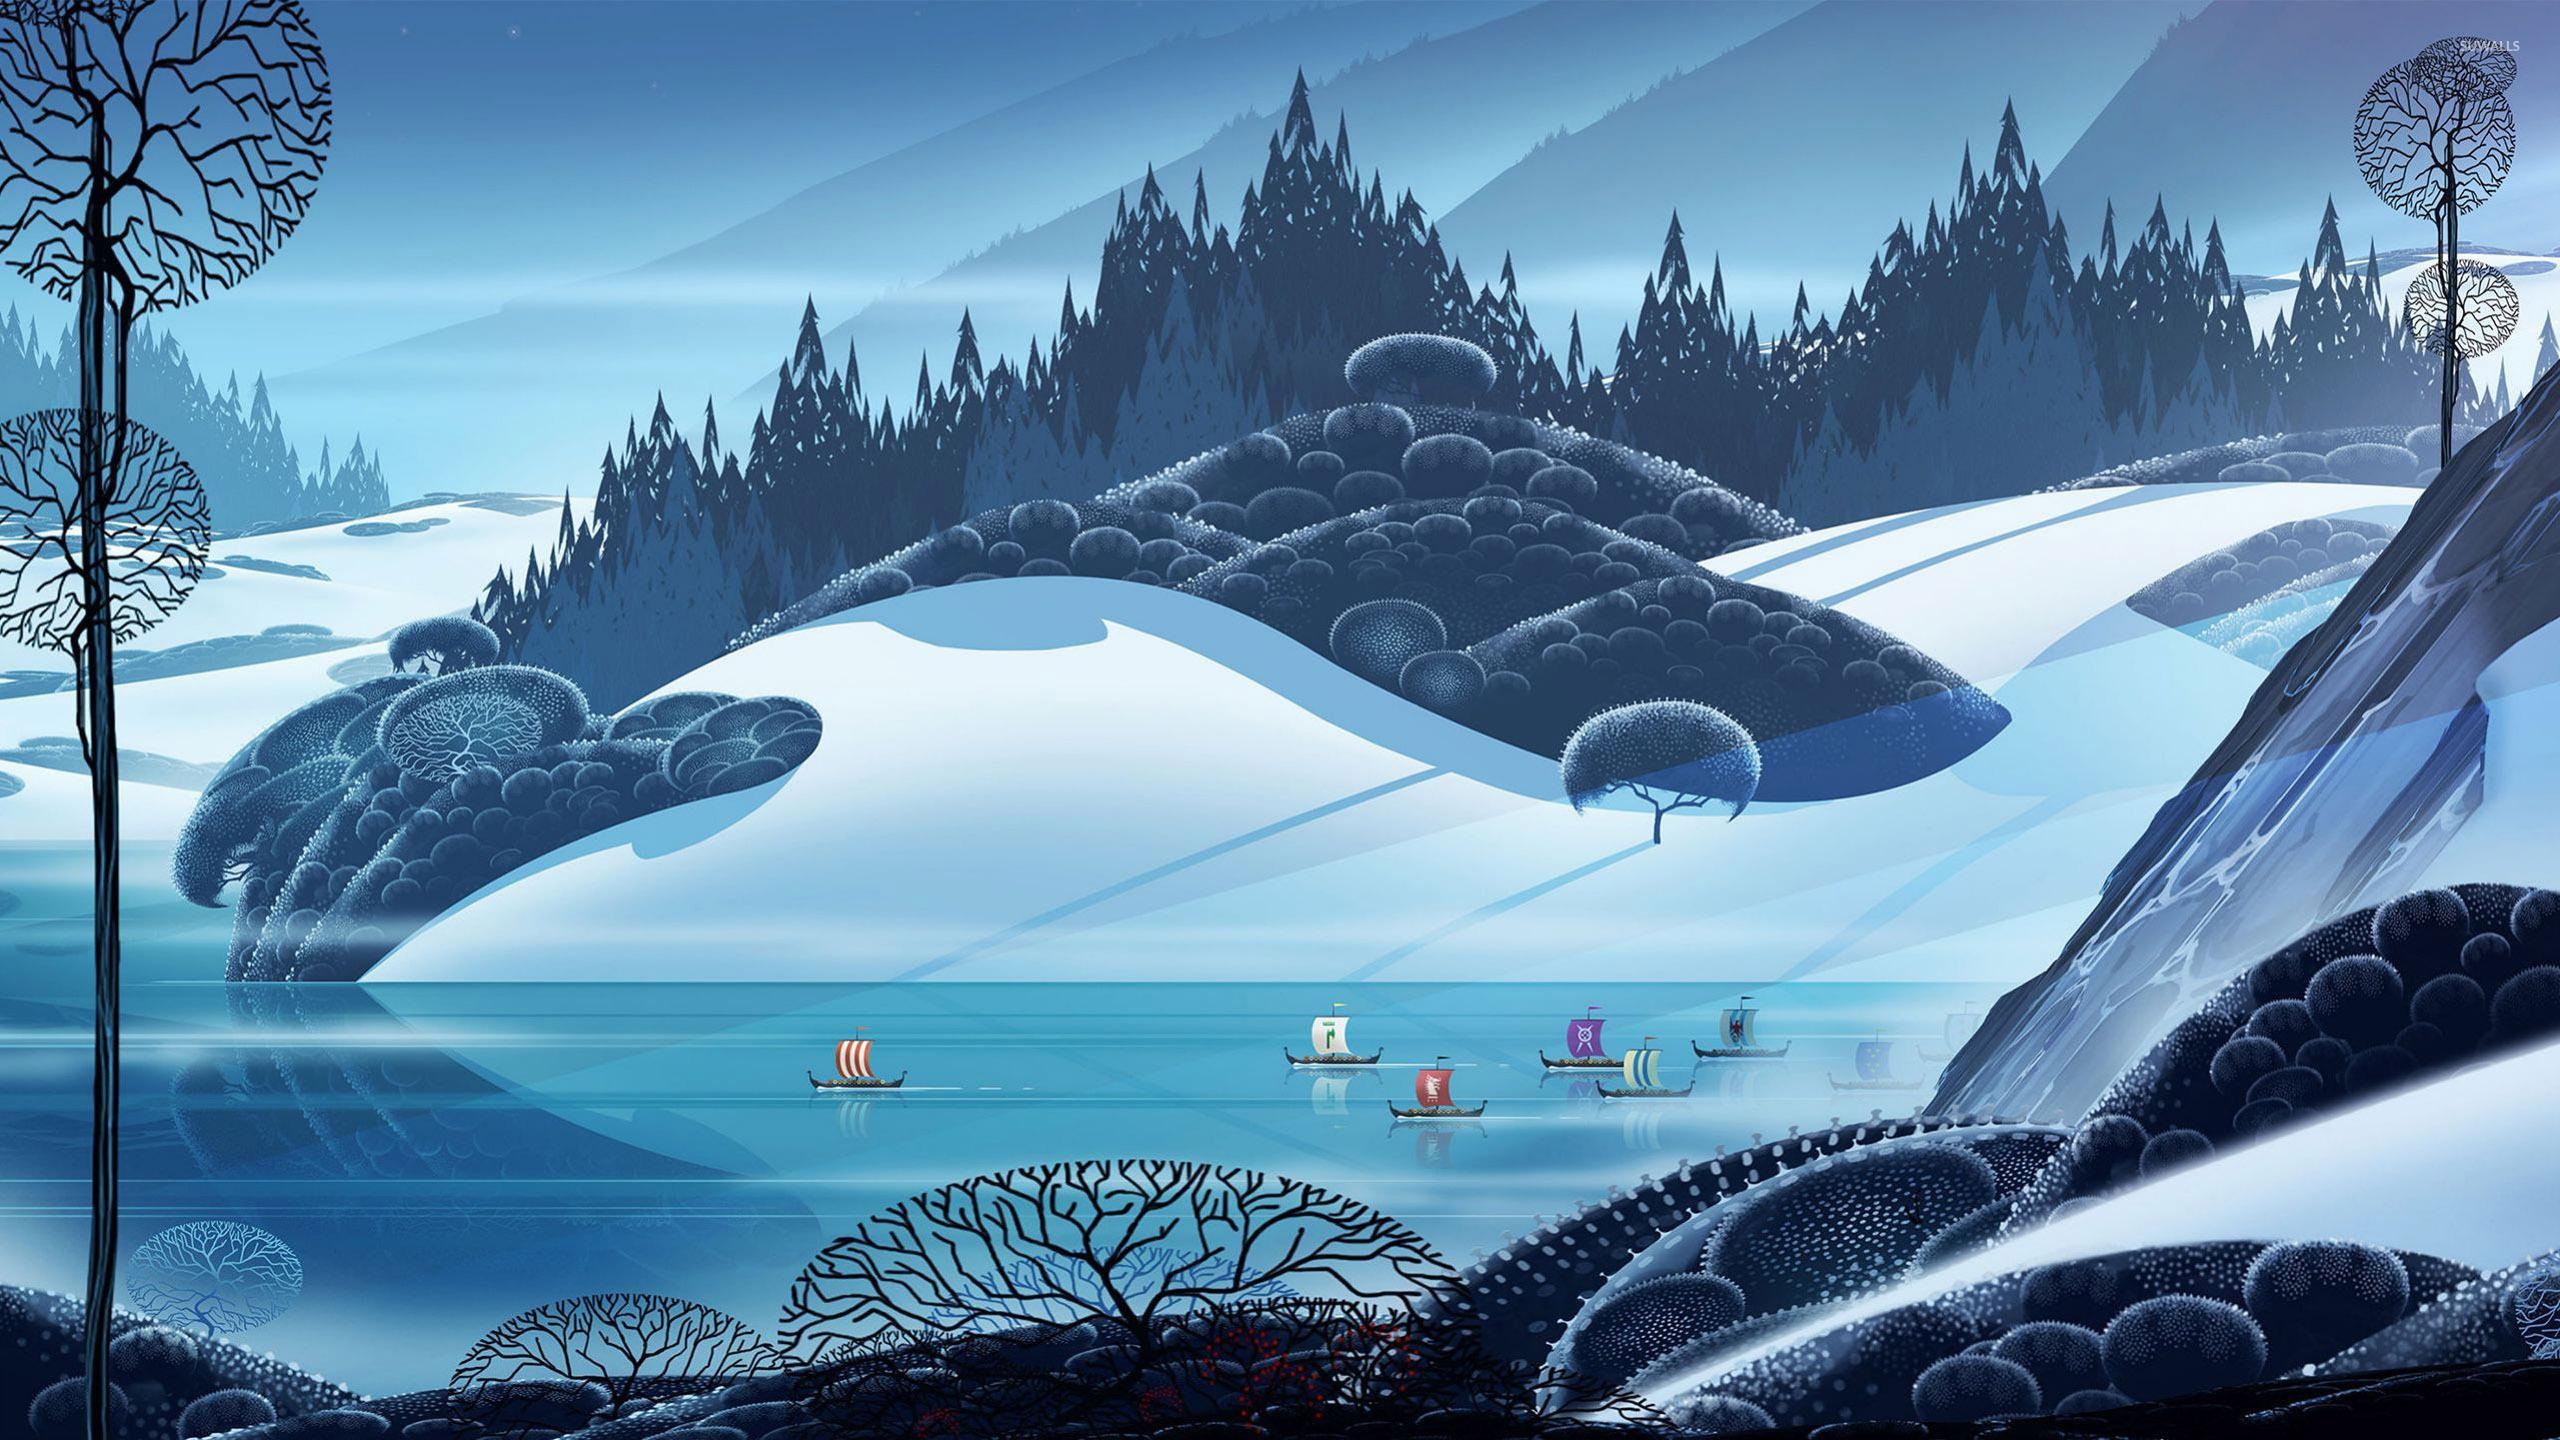 viking ship race wallpaper digital art wallpapers 26553